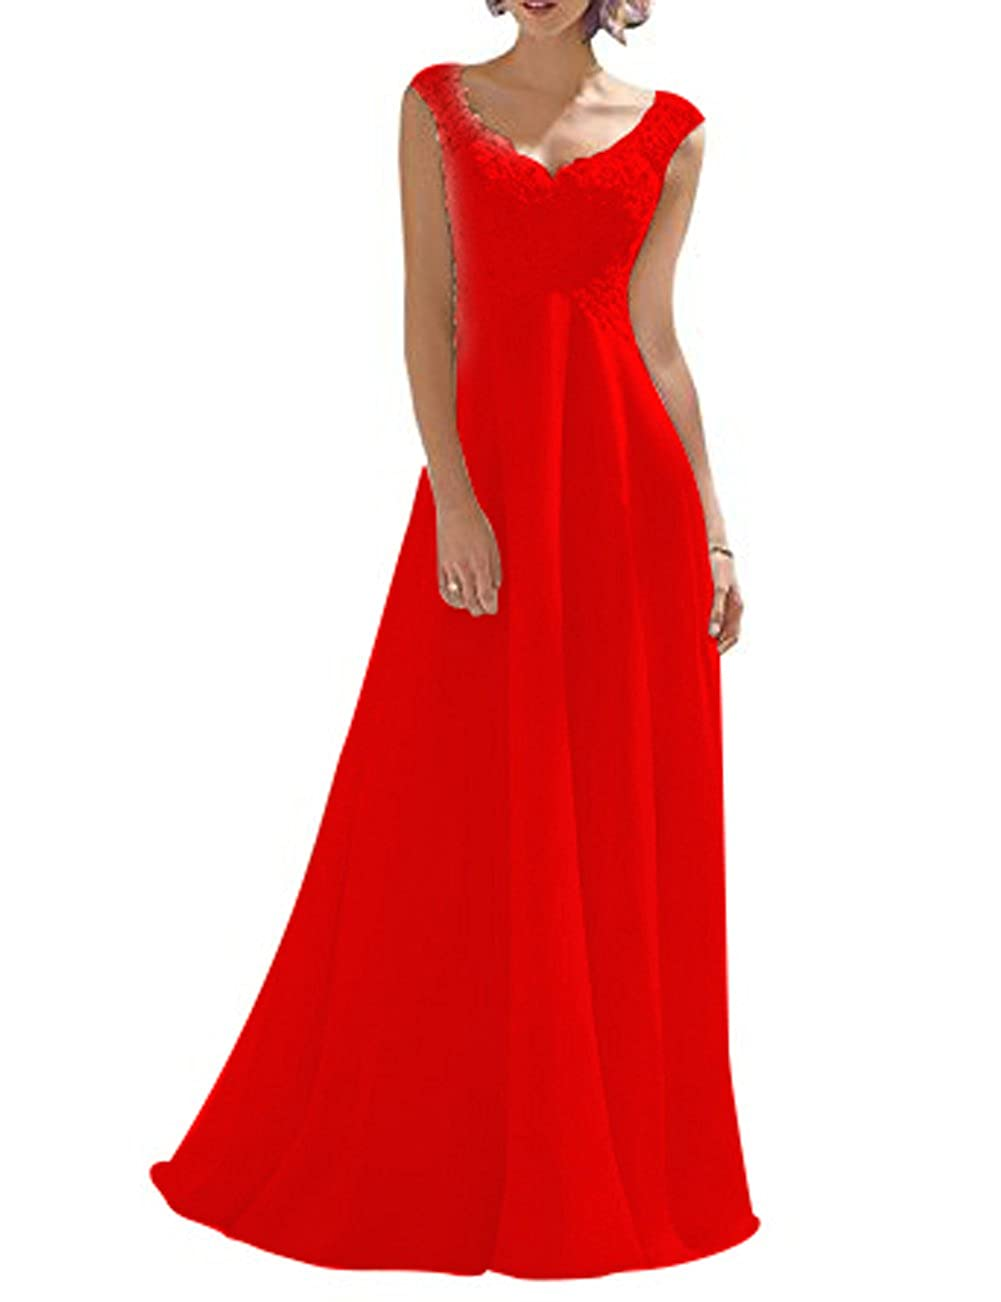 Vickyben Womens V-neck A-line Lace Straps Chiffon Long Beach Bridal Gown Wedding Dress